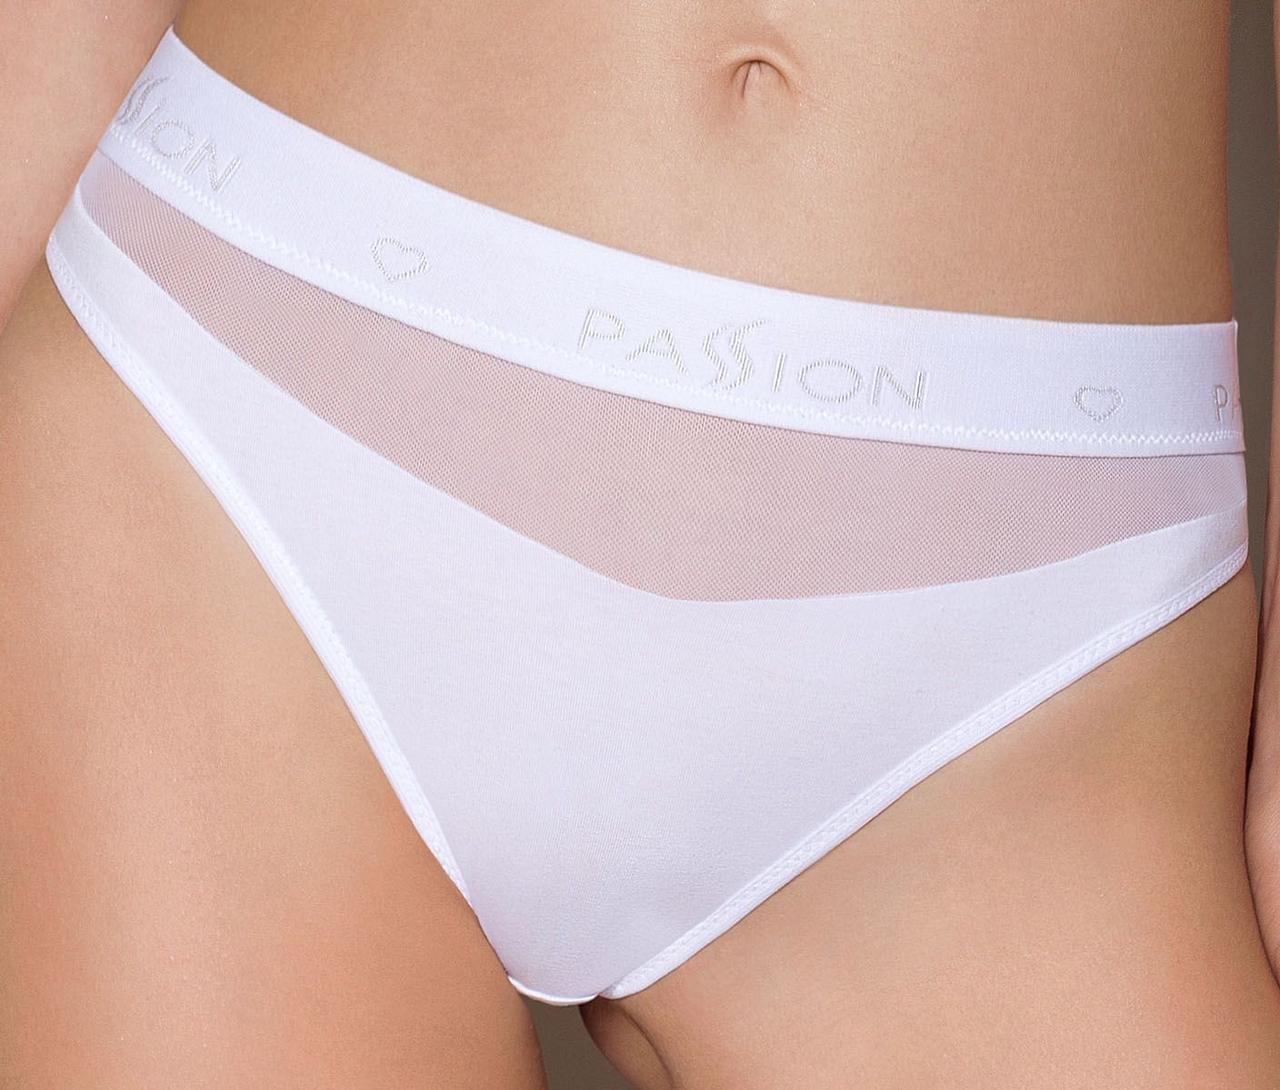 Трусики с прозрачной вставкой Passion PS006 PANTIES white, size L